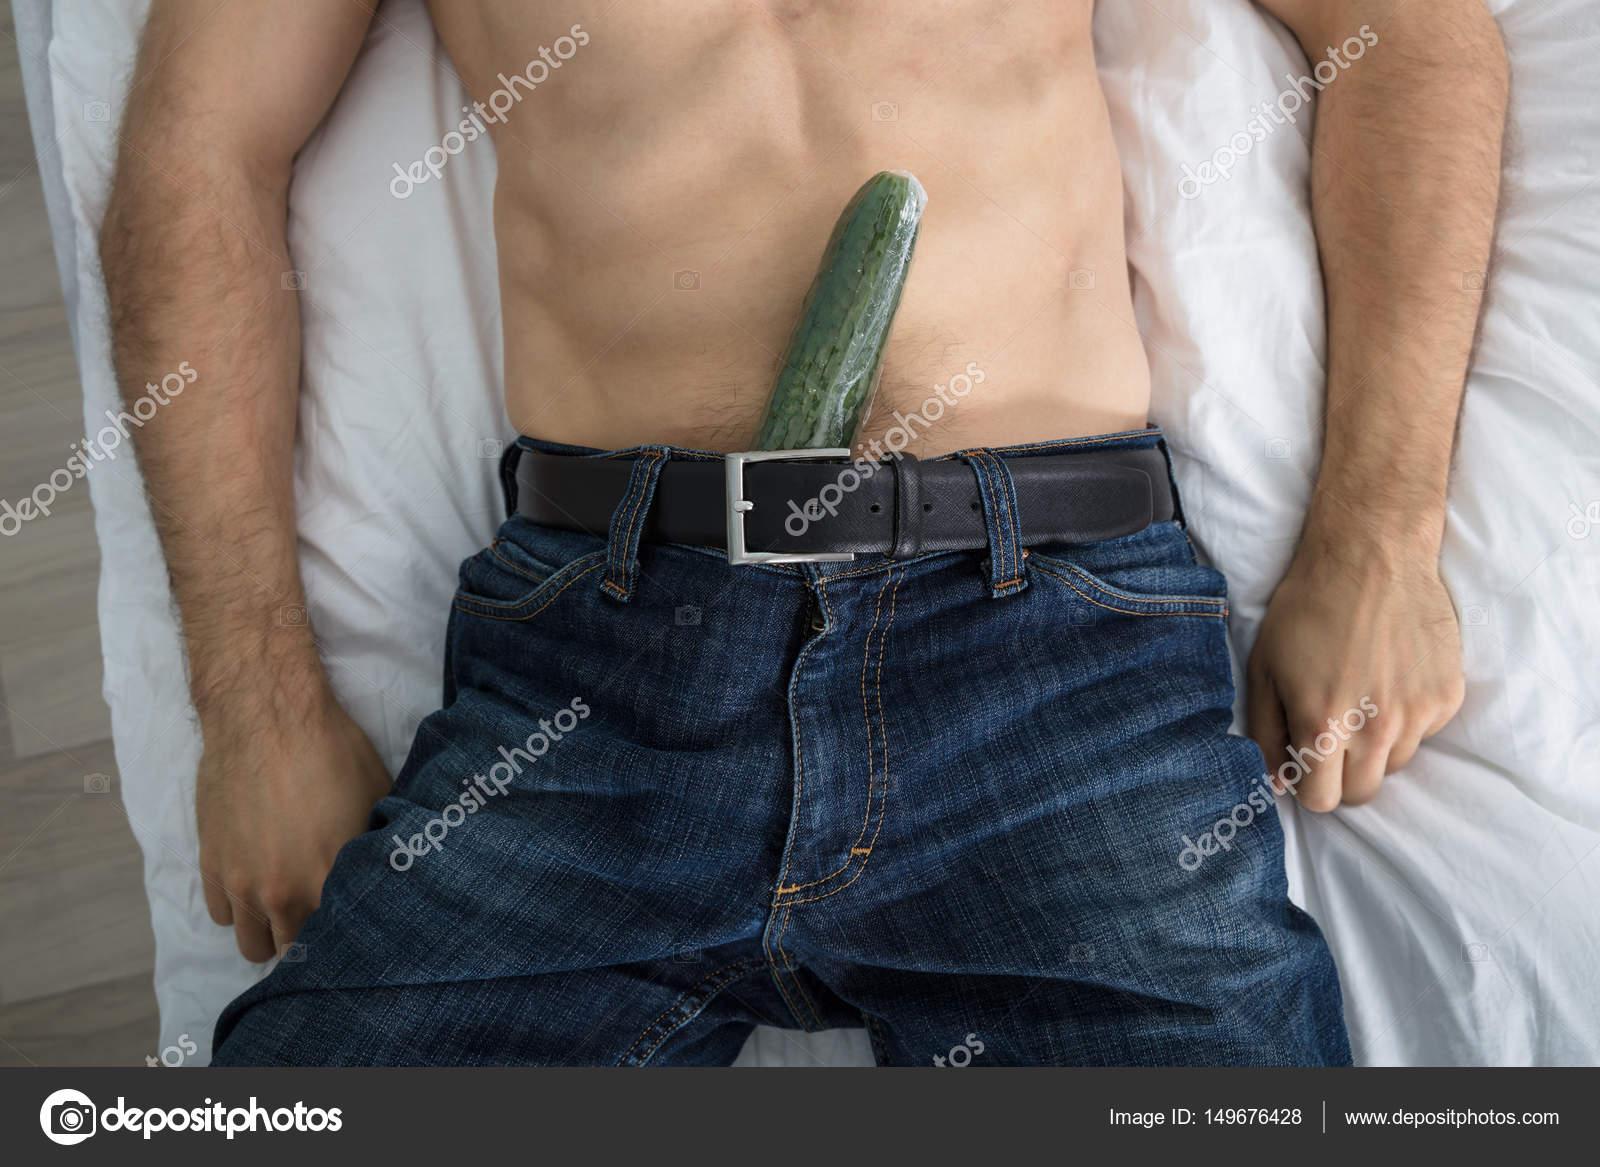 xxx pictures virgen pussy fucking